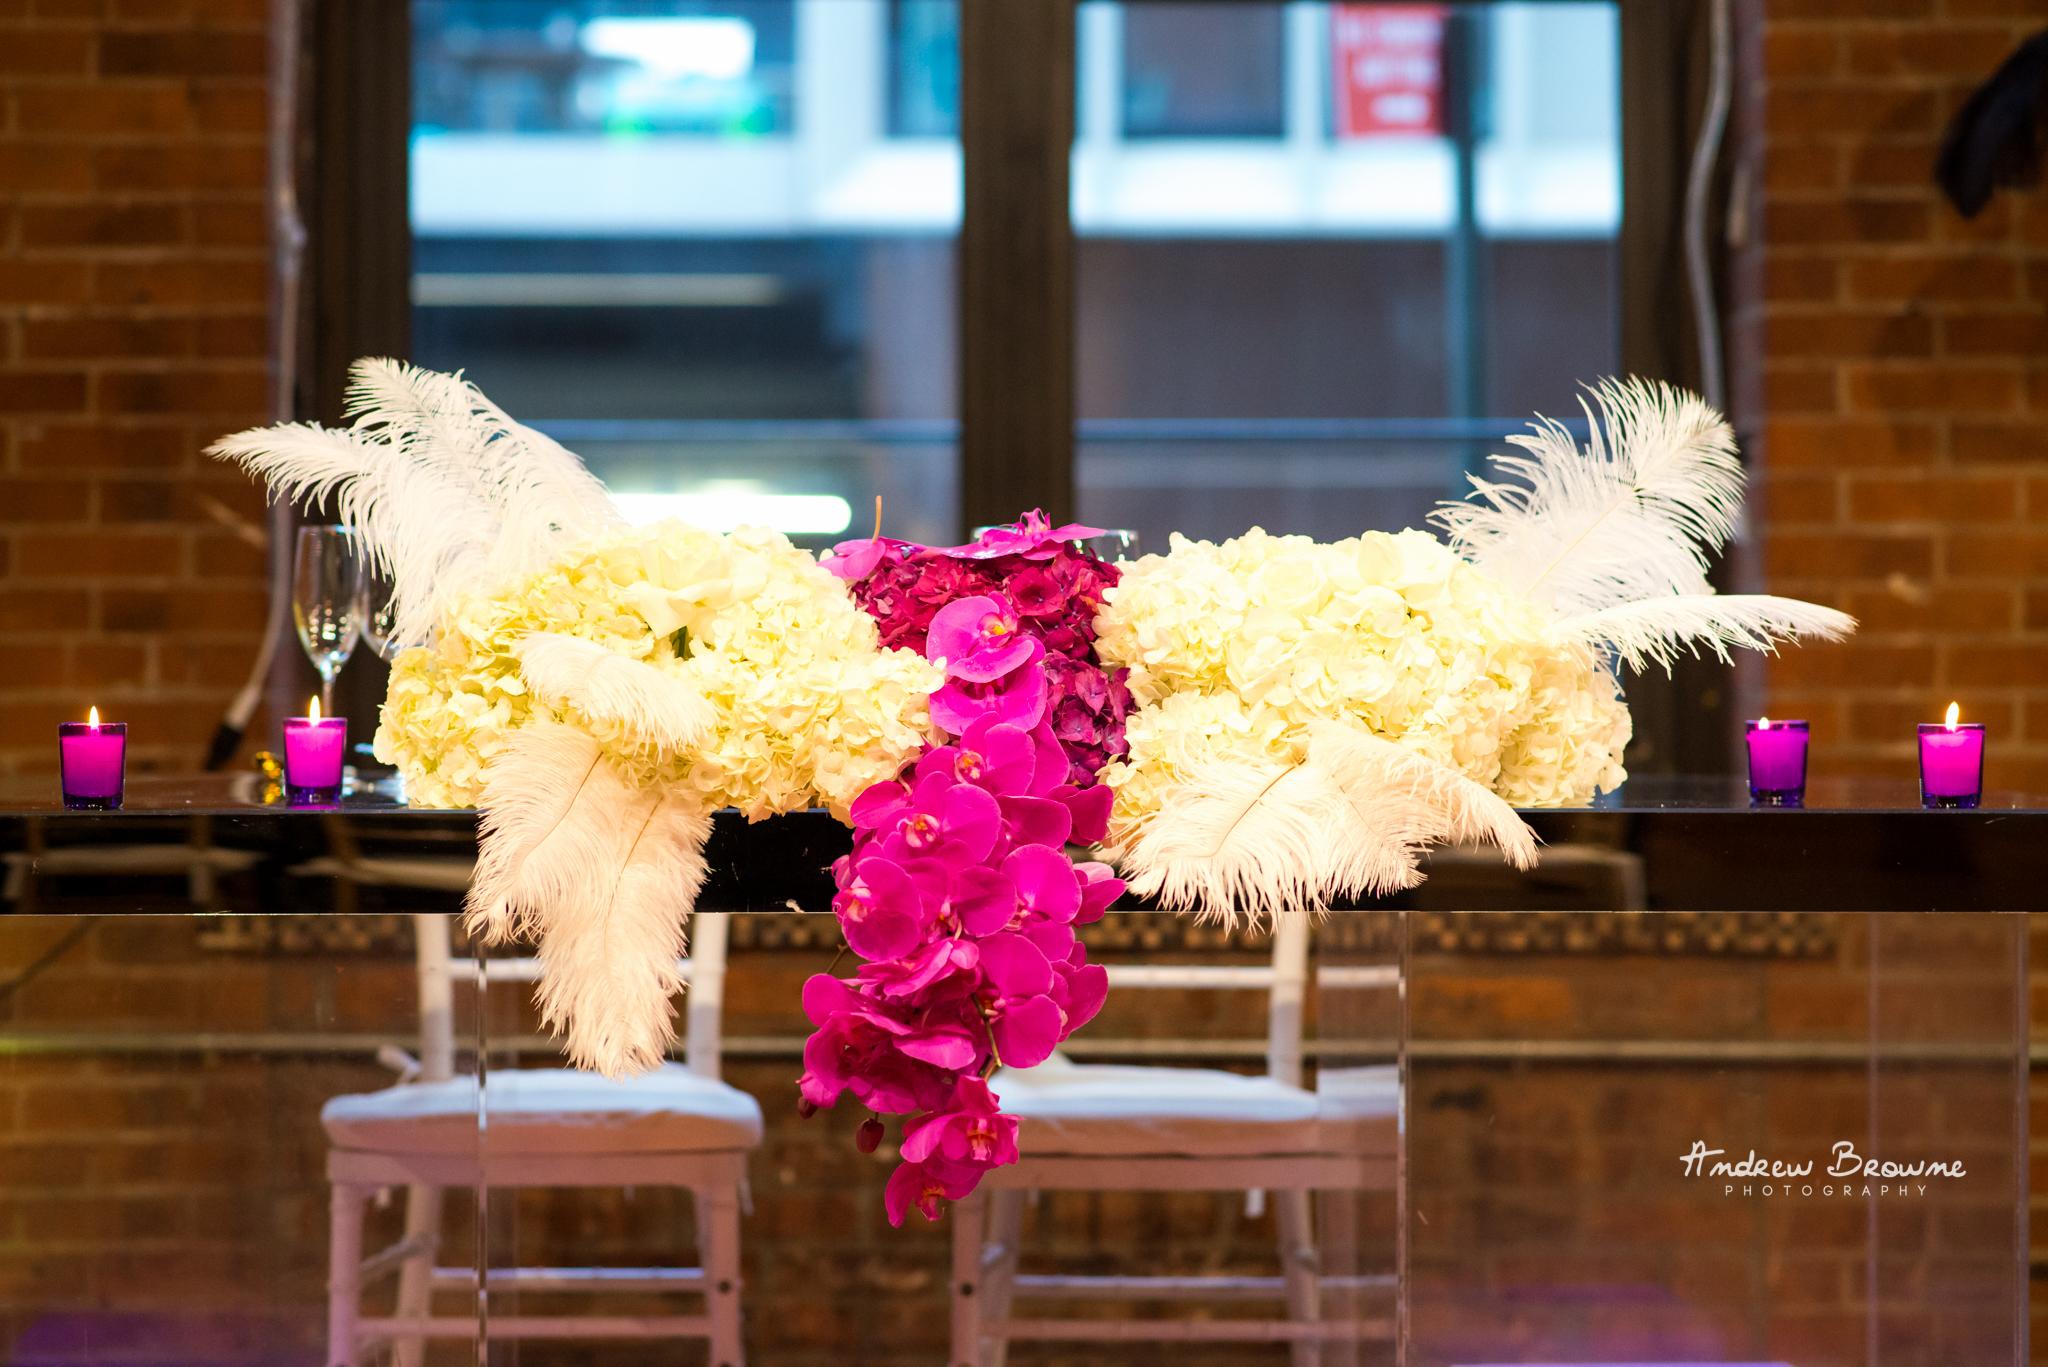 Harlem Renaissance Brooklyn Loft Wedding Flowers Sweet Heart Table.jpg